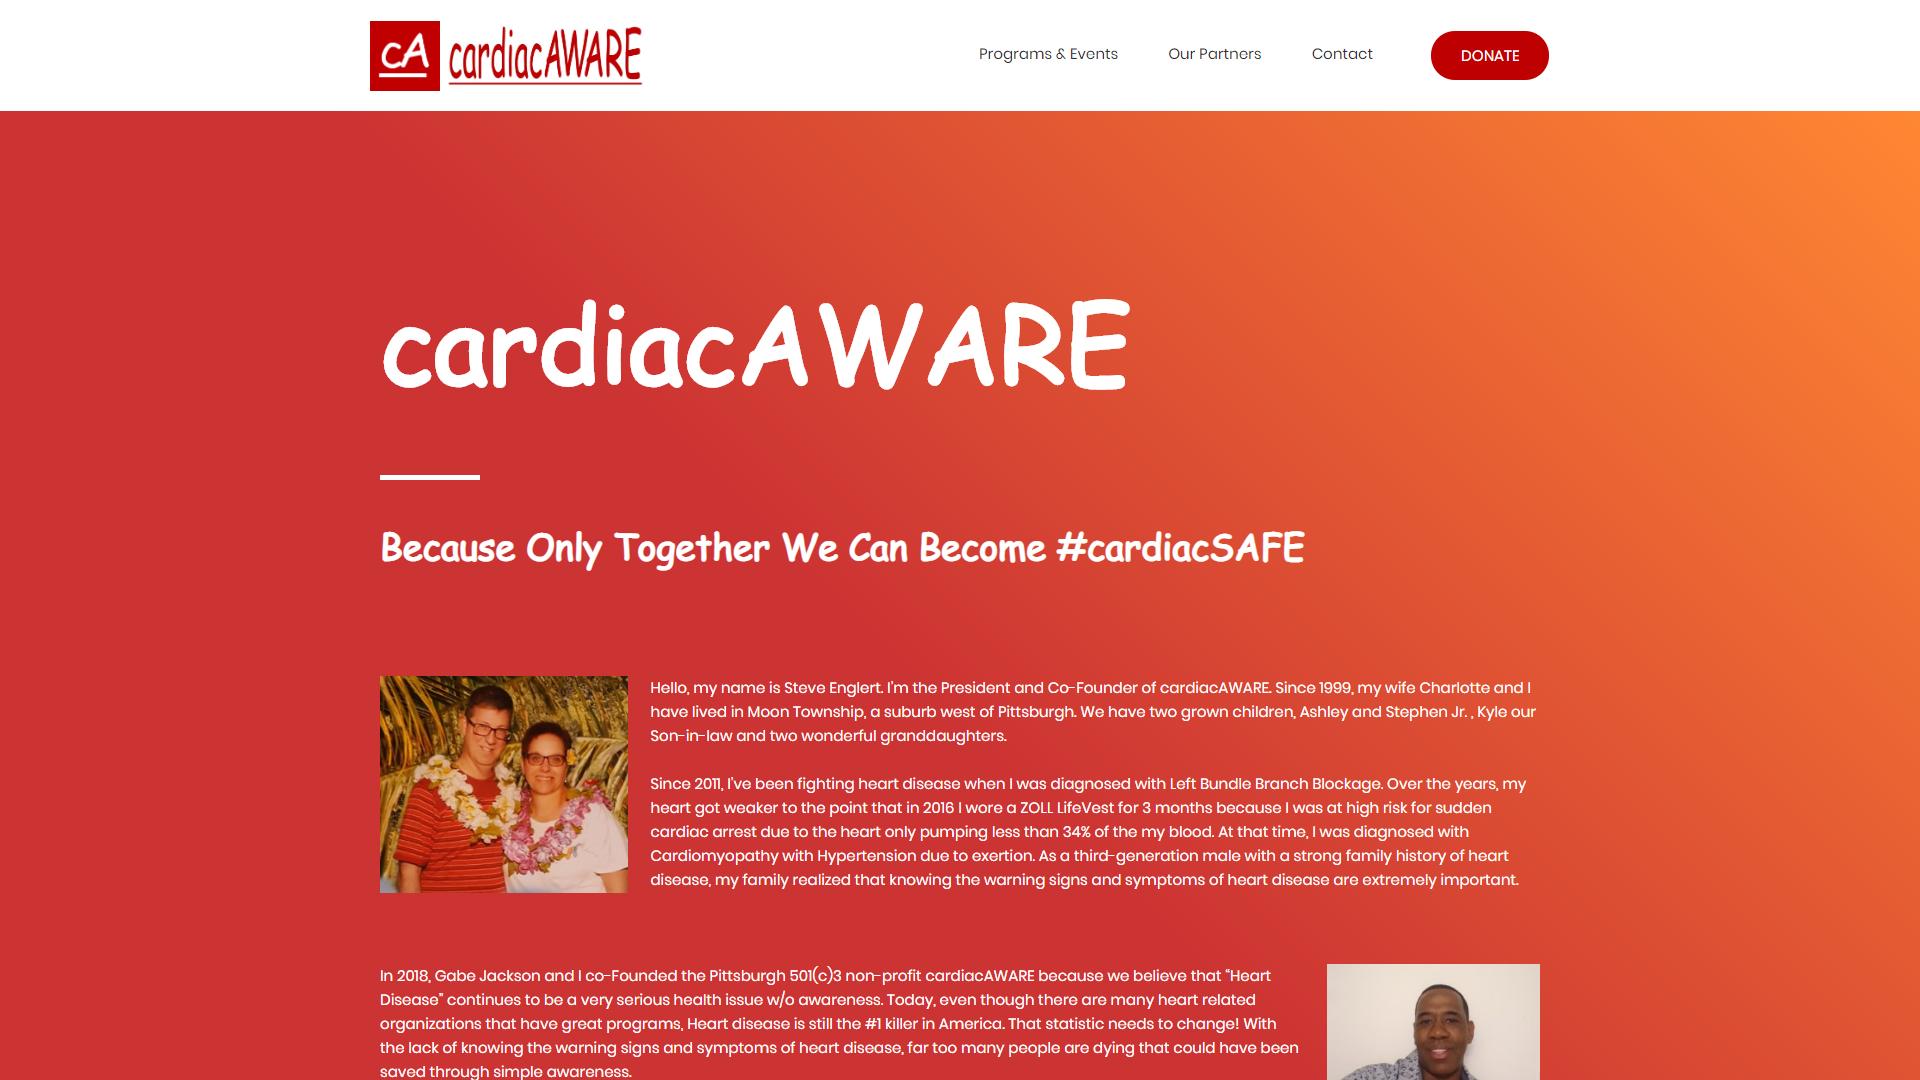 cardiacAWARE